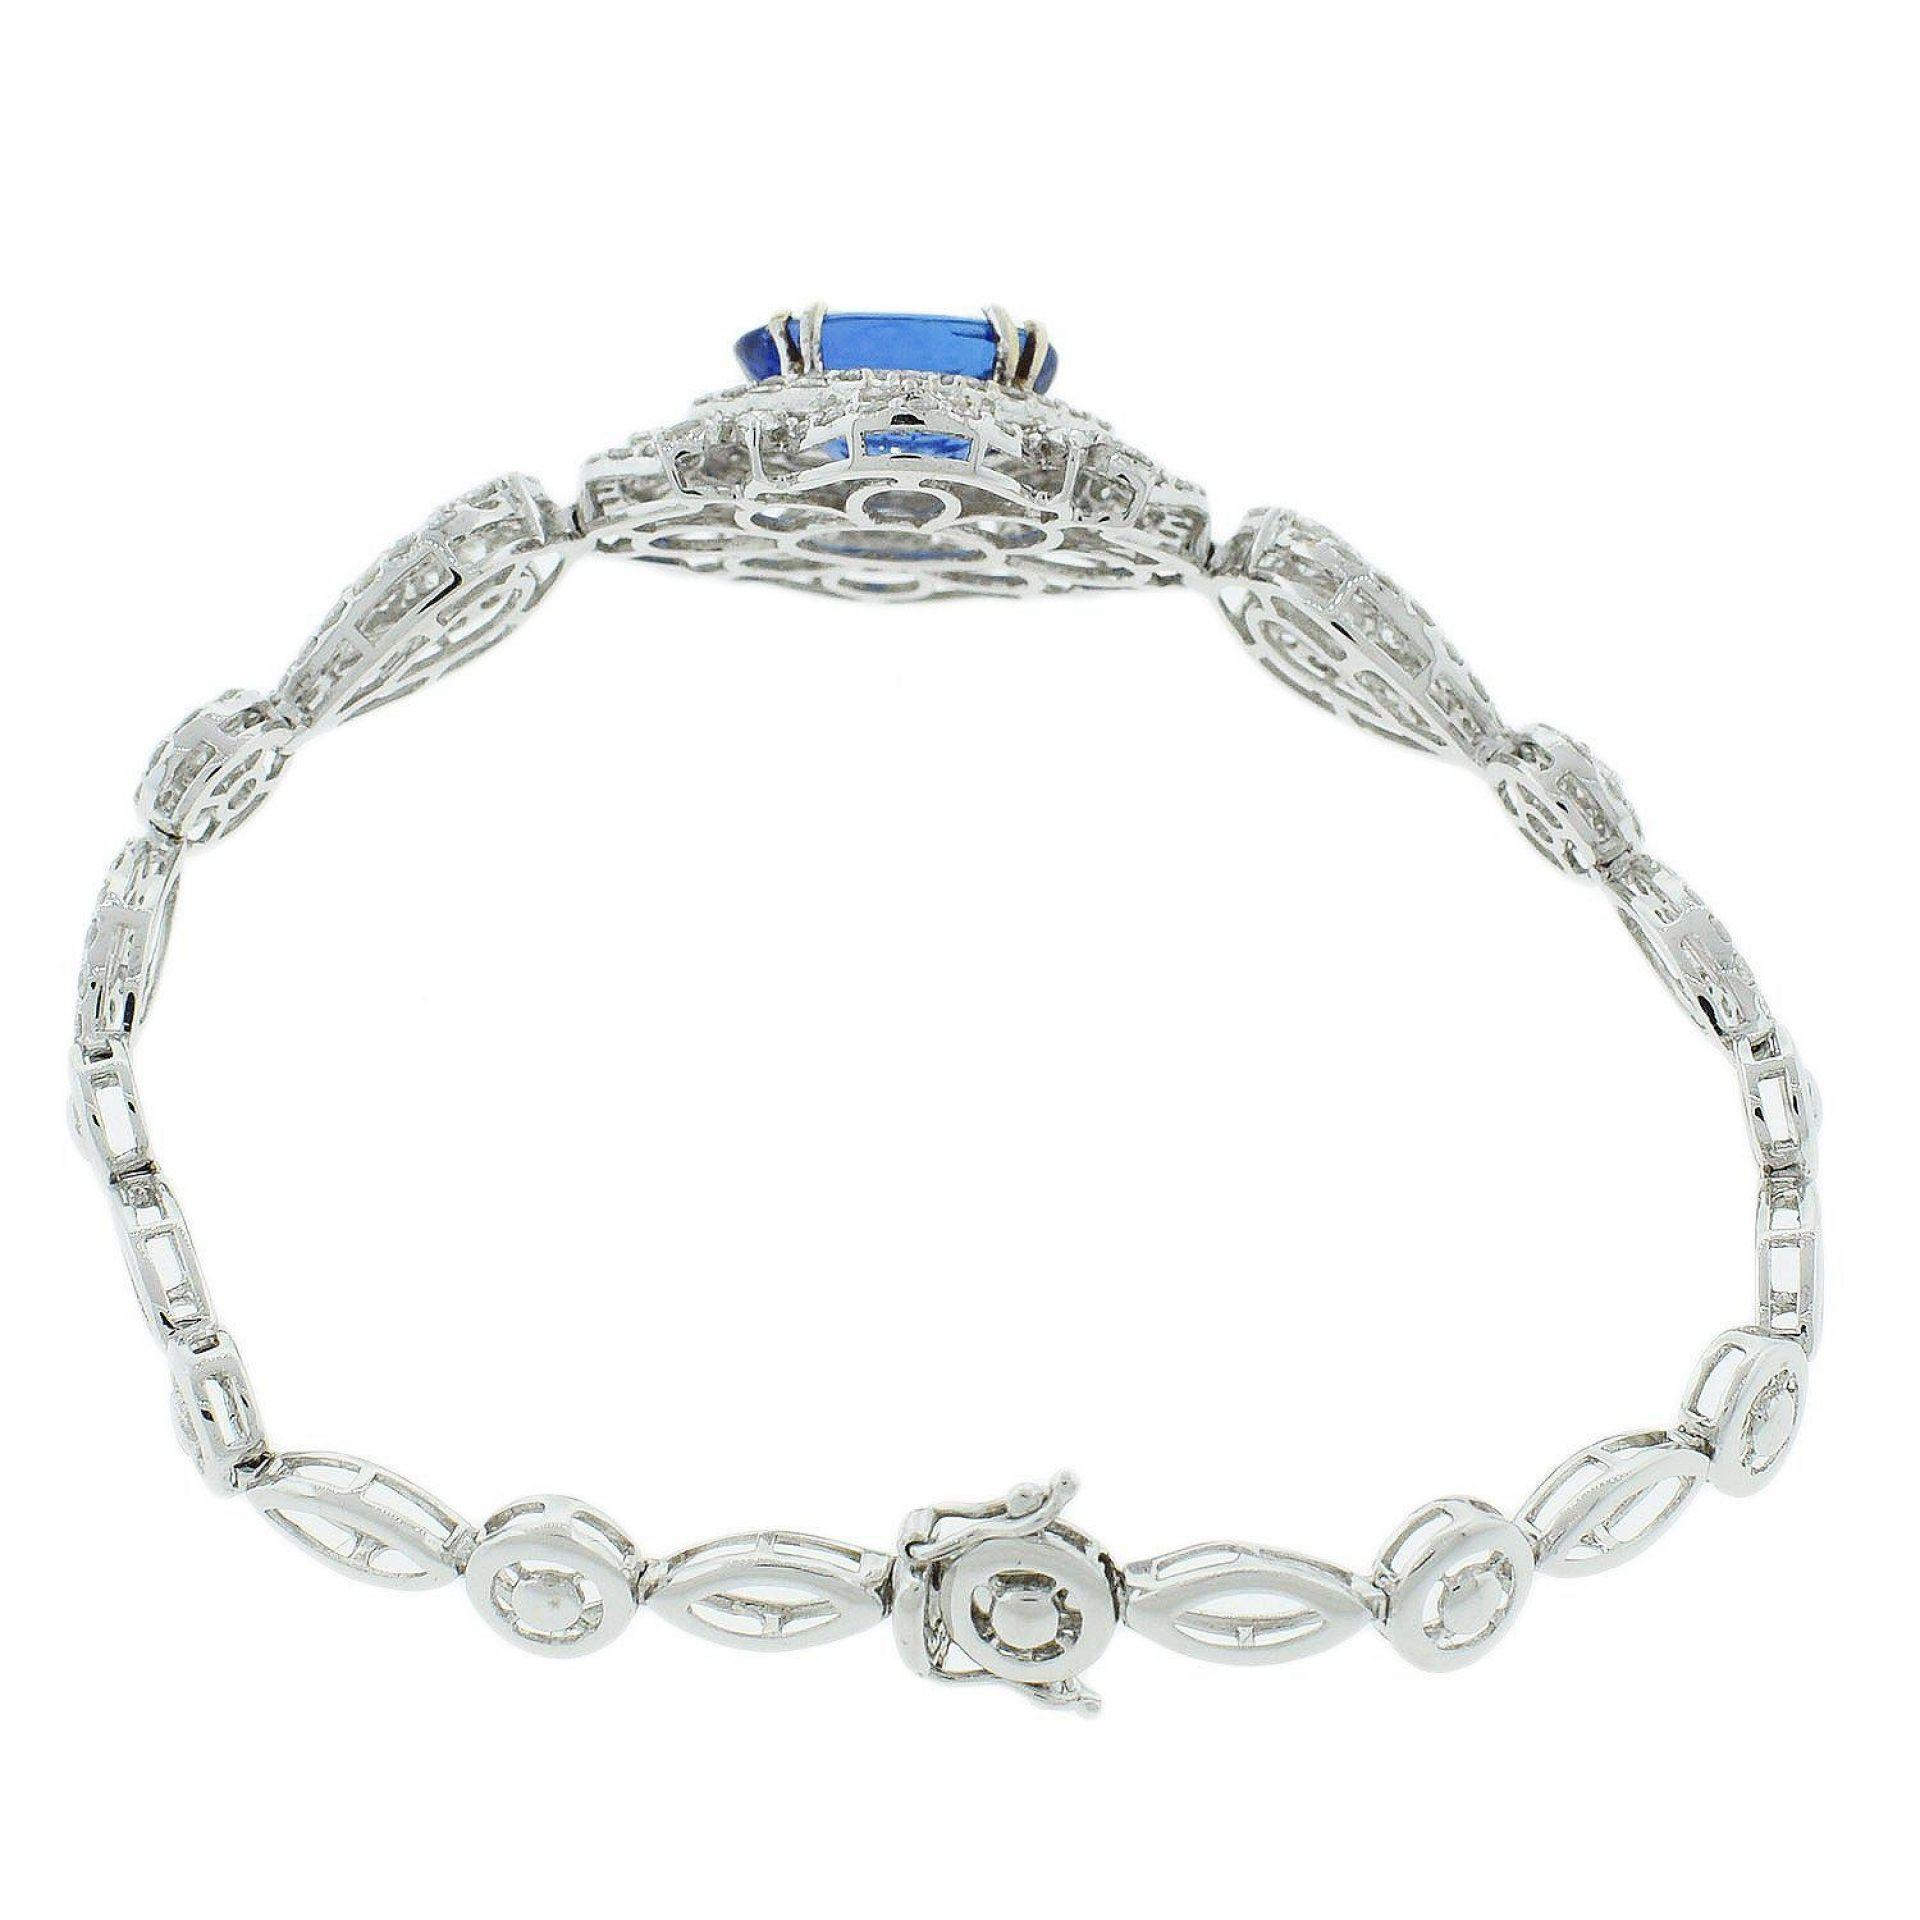 5.83ct Tanzanite and 4.02ctw Diamond 18KT White Gold Bracelet